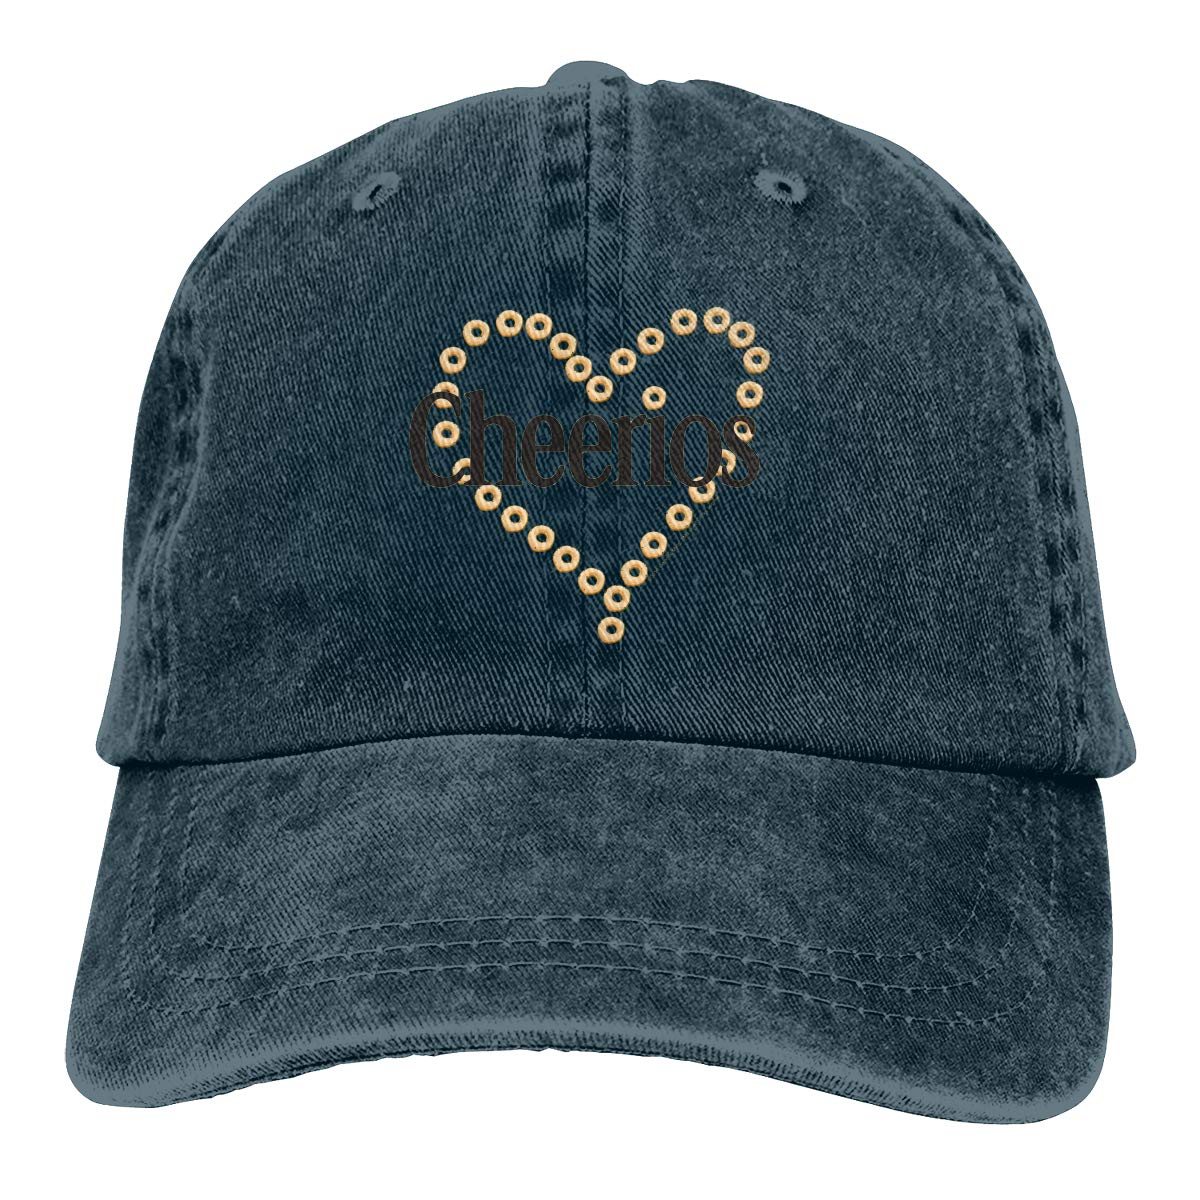 Sajfirlug Cheerios Heart Fashion Adjustable Cowboy Cap Baseball Cap for Women and Men